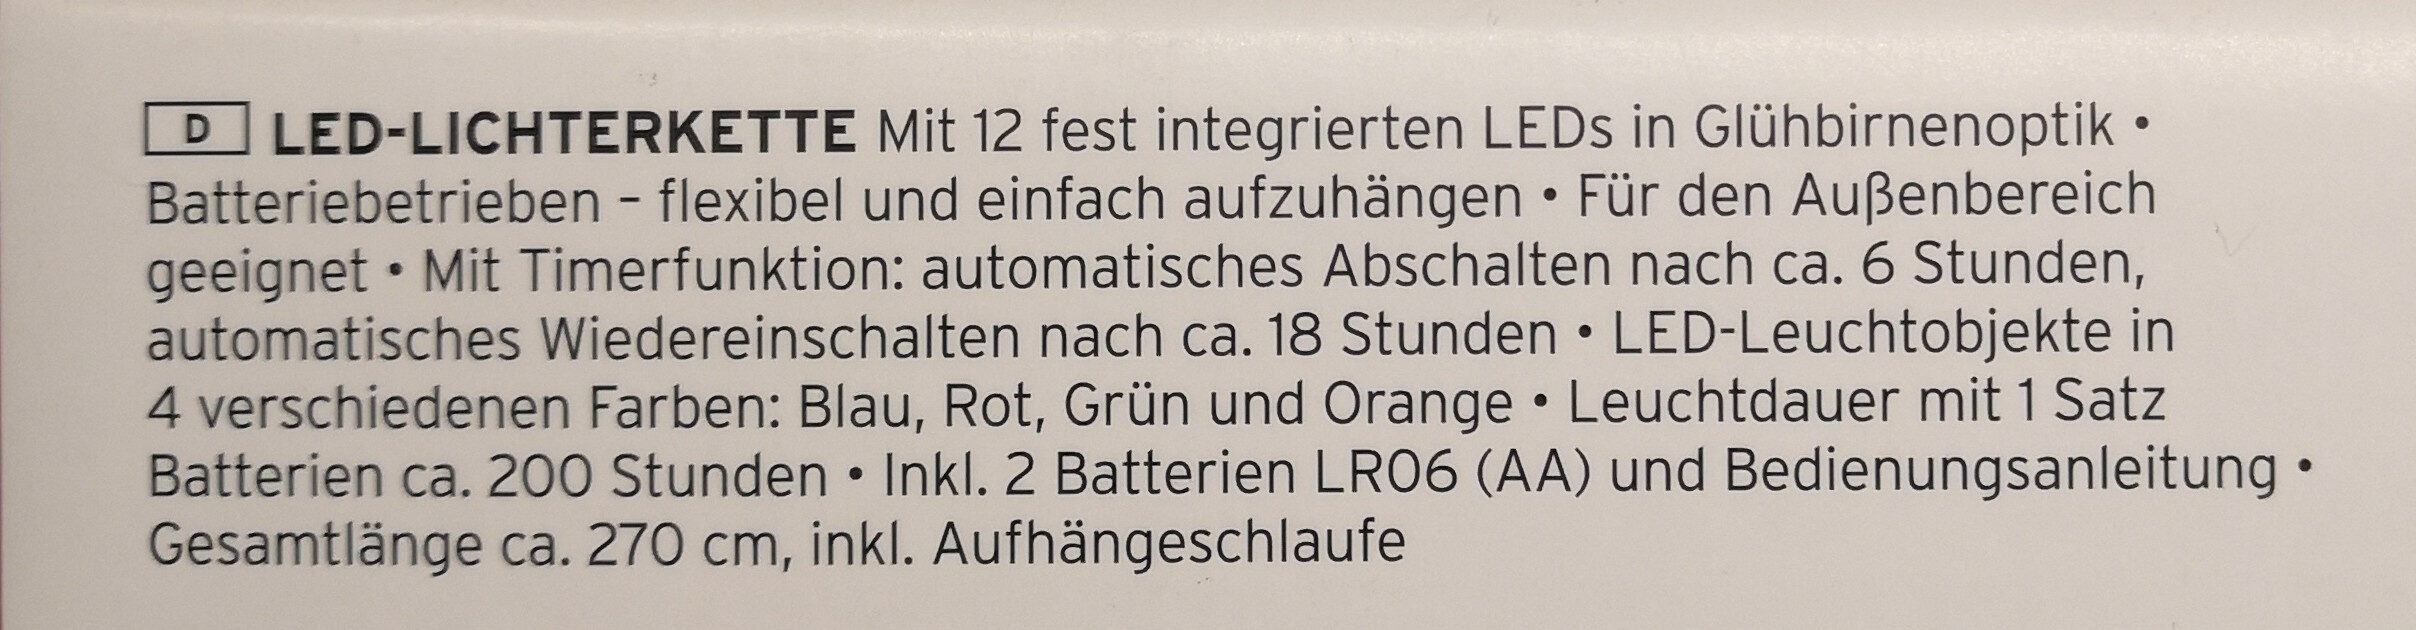 LED-Lichterkette - Ingredients - de